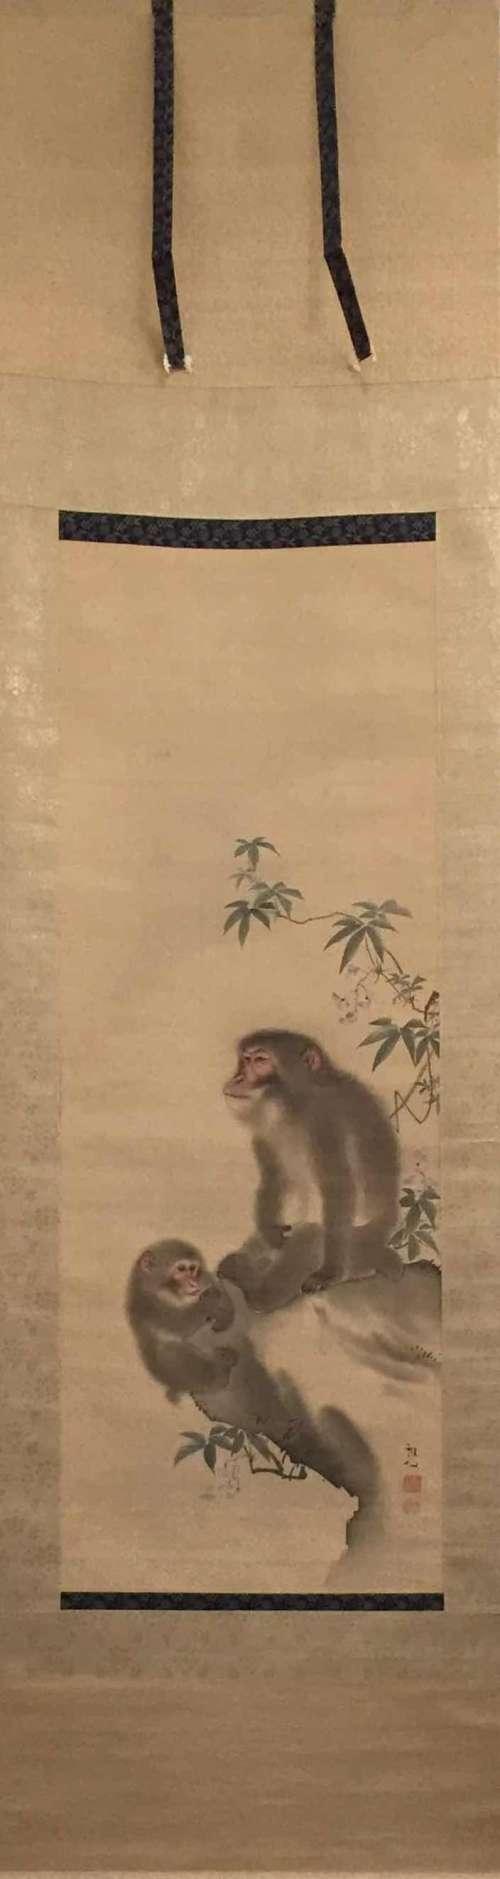 SVJD 0009-1. Mori Sosen